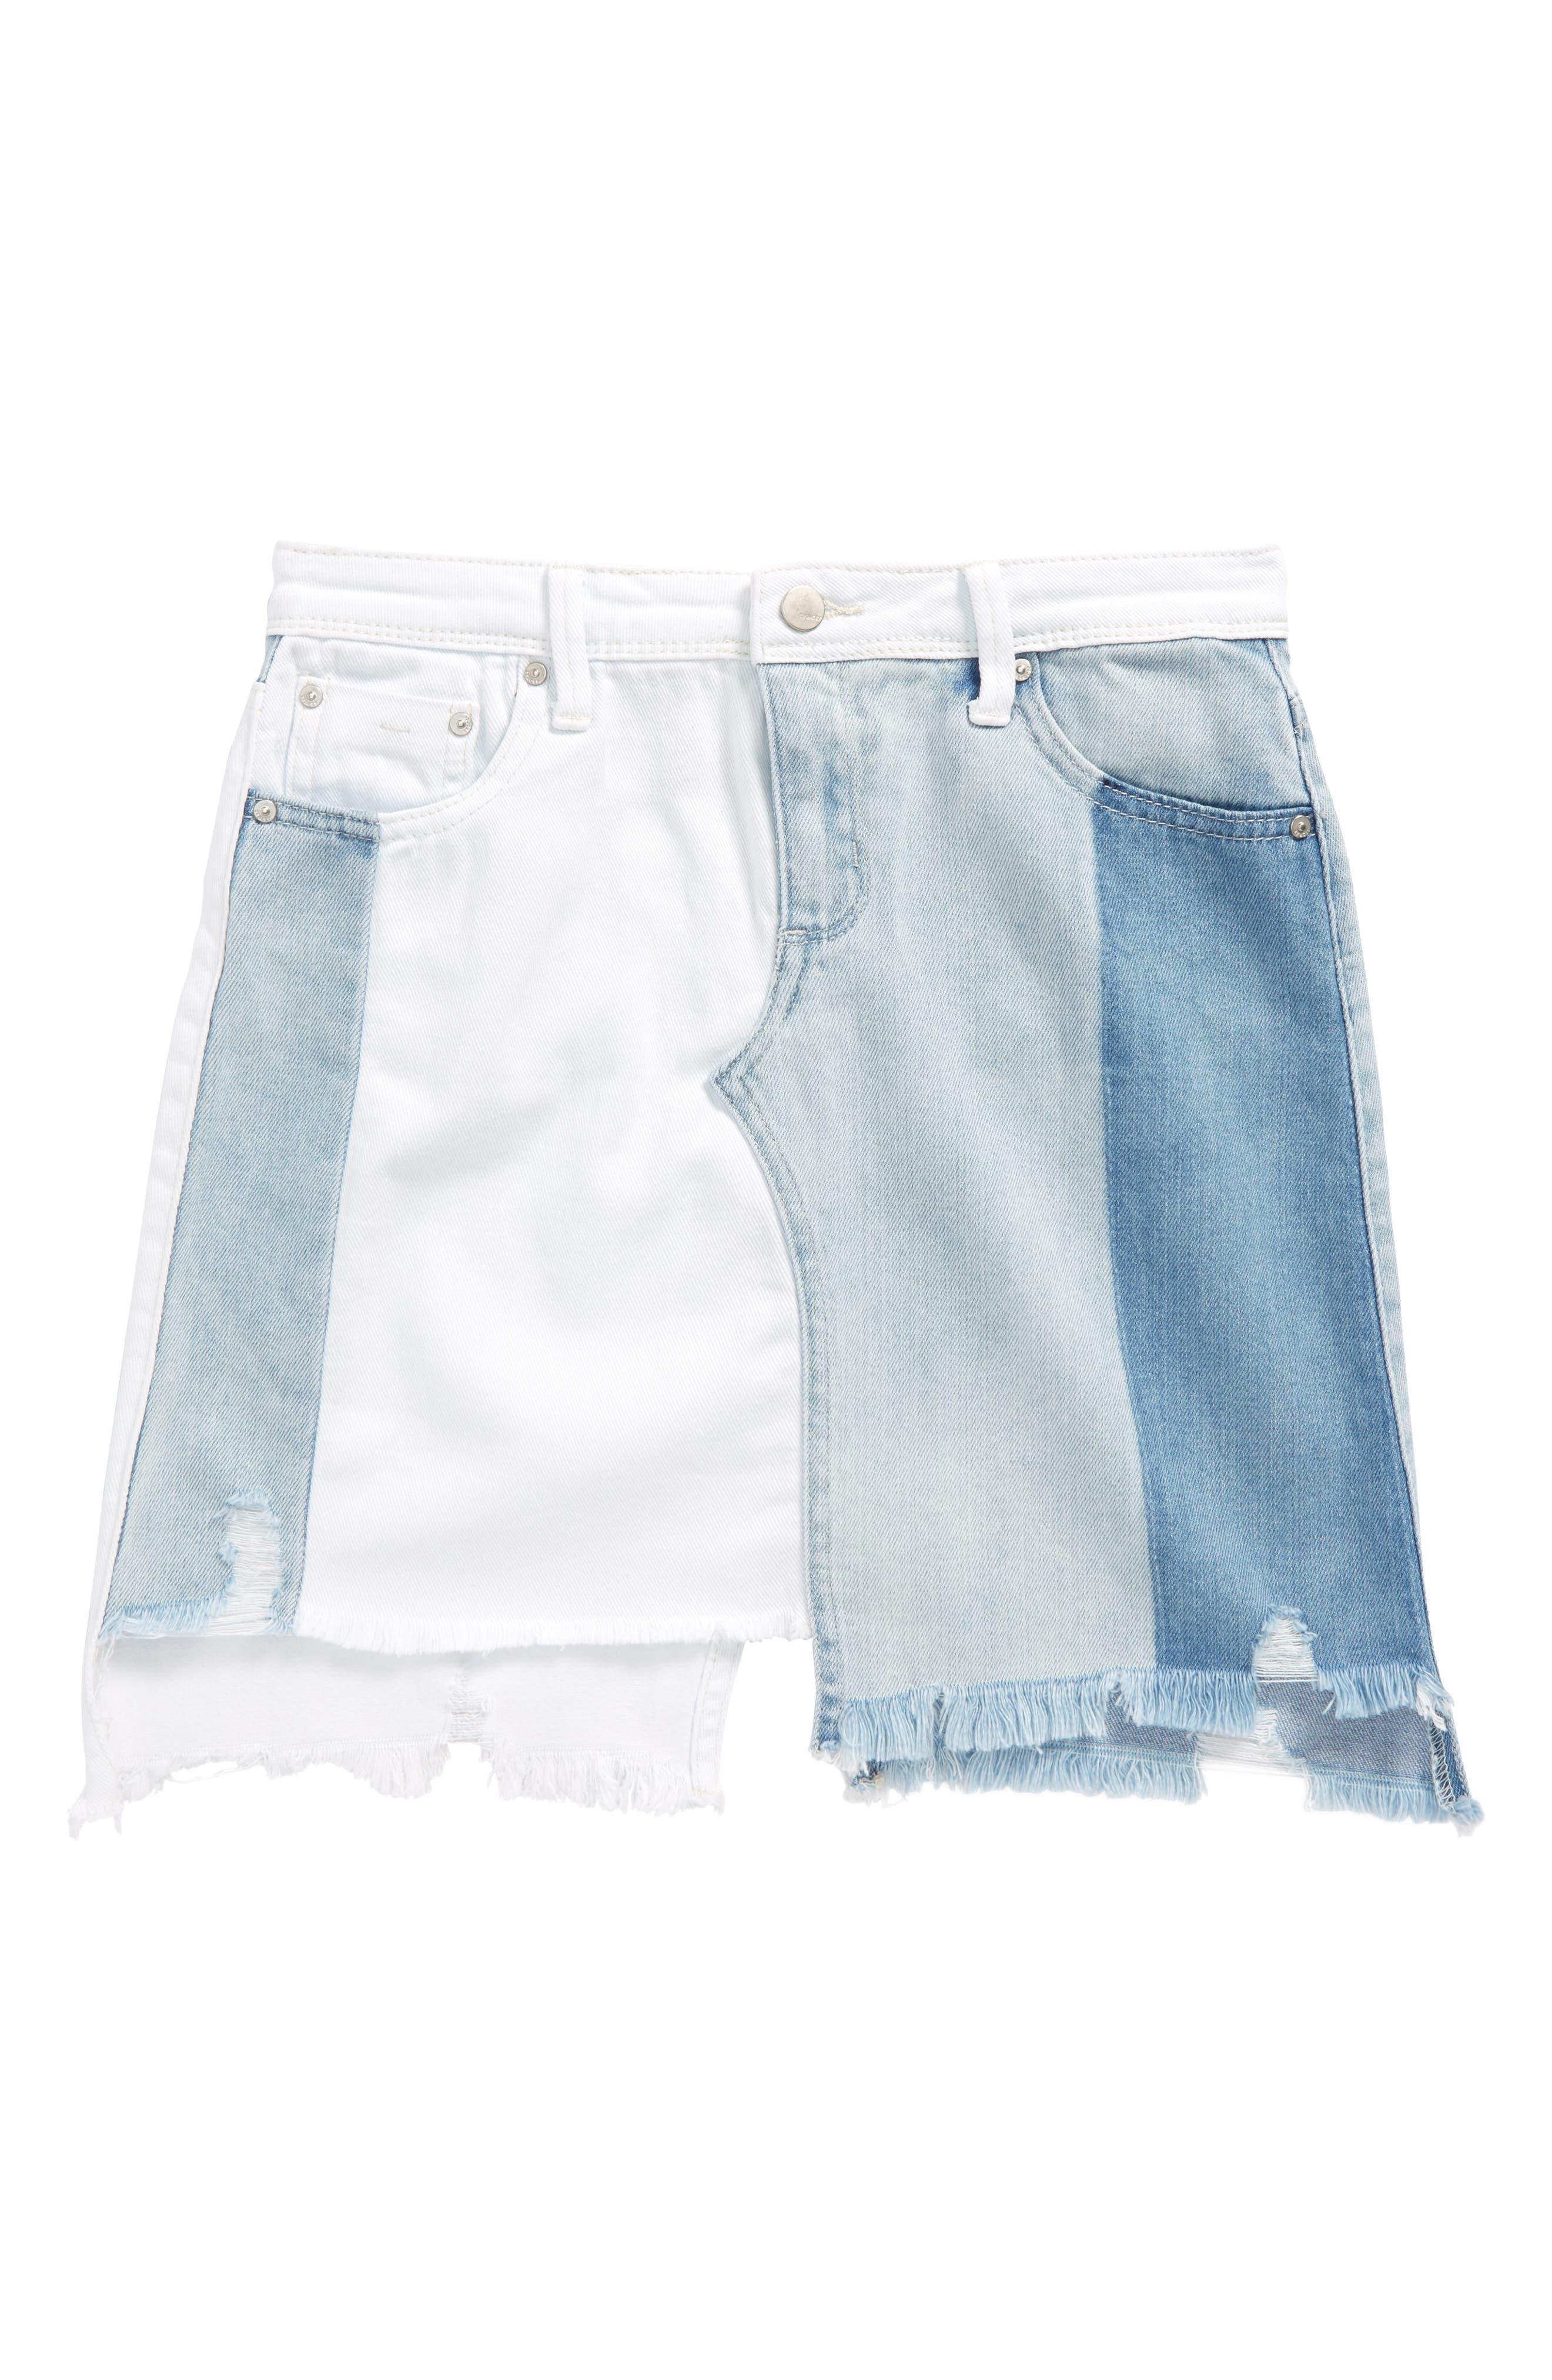 Patchwork Denim Skirt,                             Main thumbnail 1, color,                             White/ Indigo